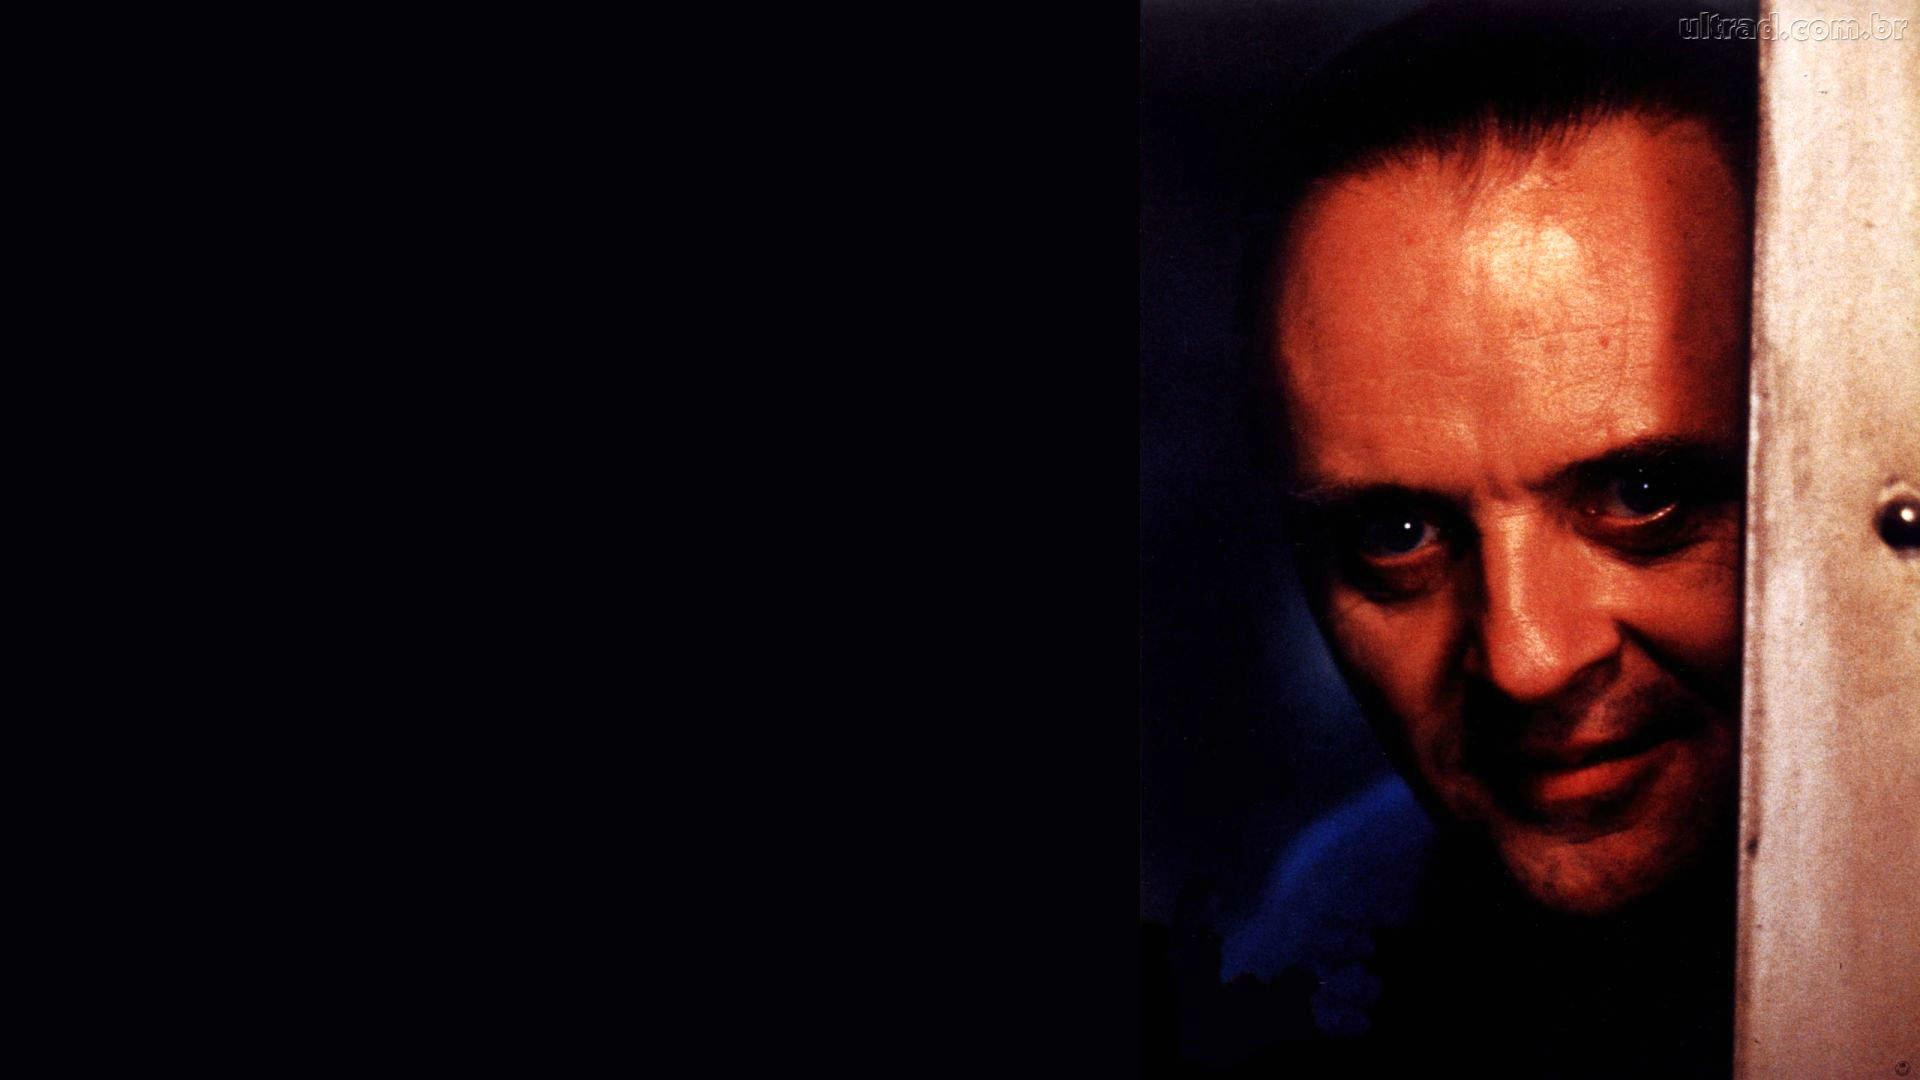 Silence Of The Lambs Crime Drama Thriller Hannibal 1153751 Hd